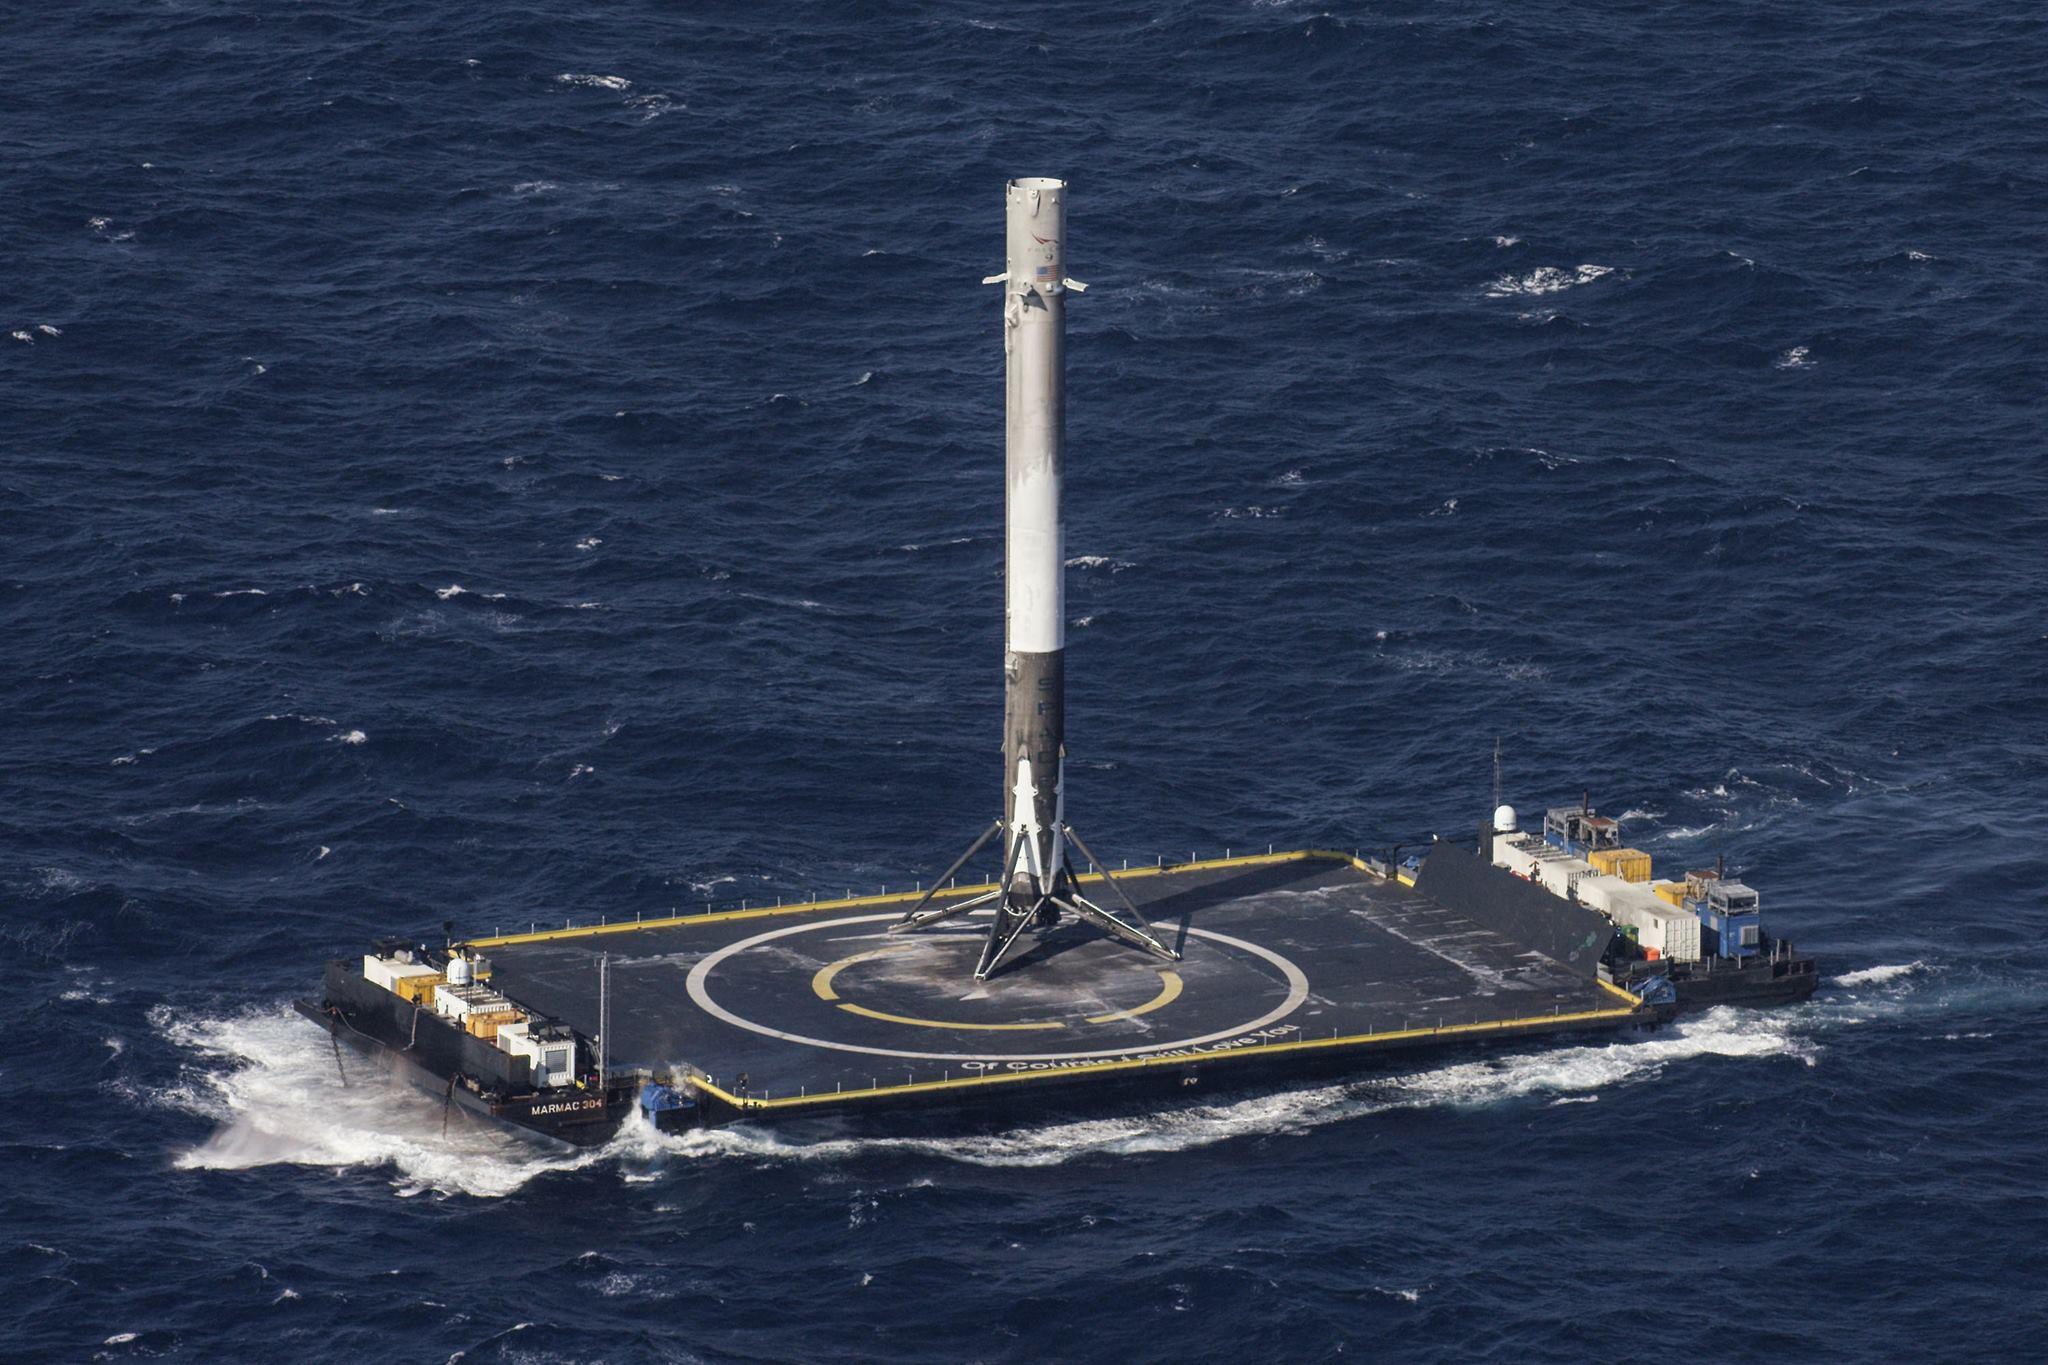 rakieta SpaceX Falcon 9 Block 5